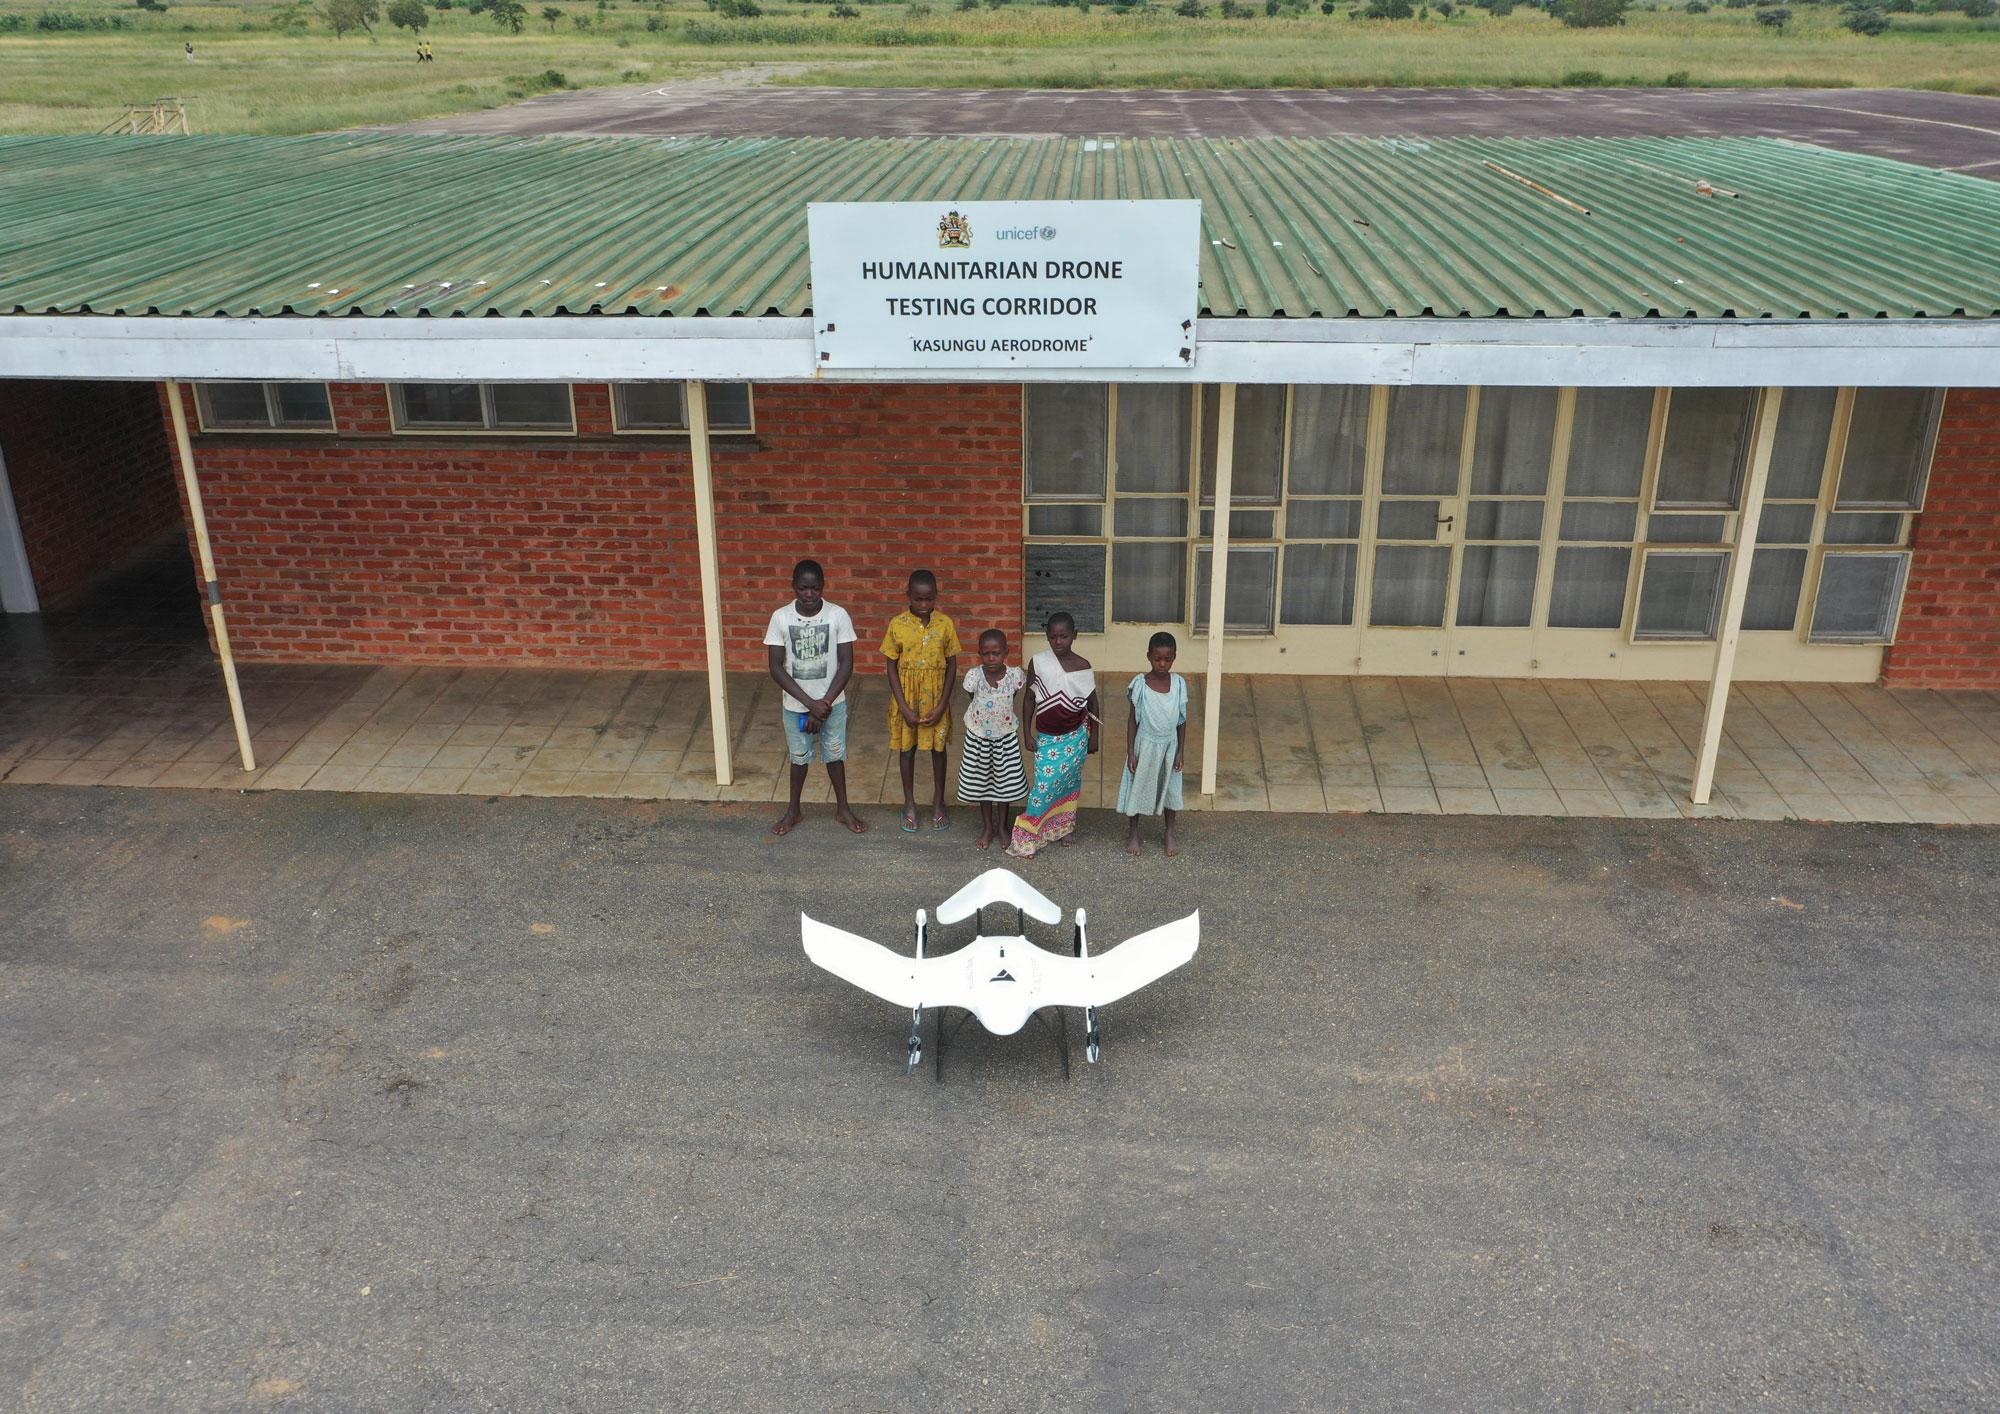 Wingcopter_Malawi_bea-08-bea